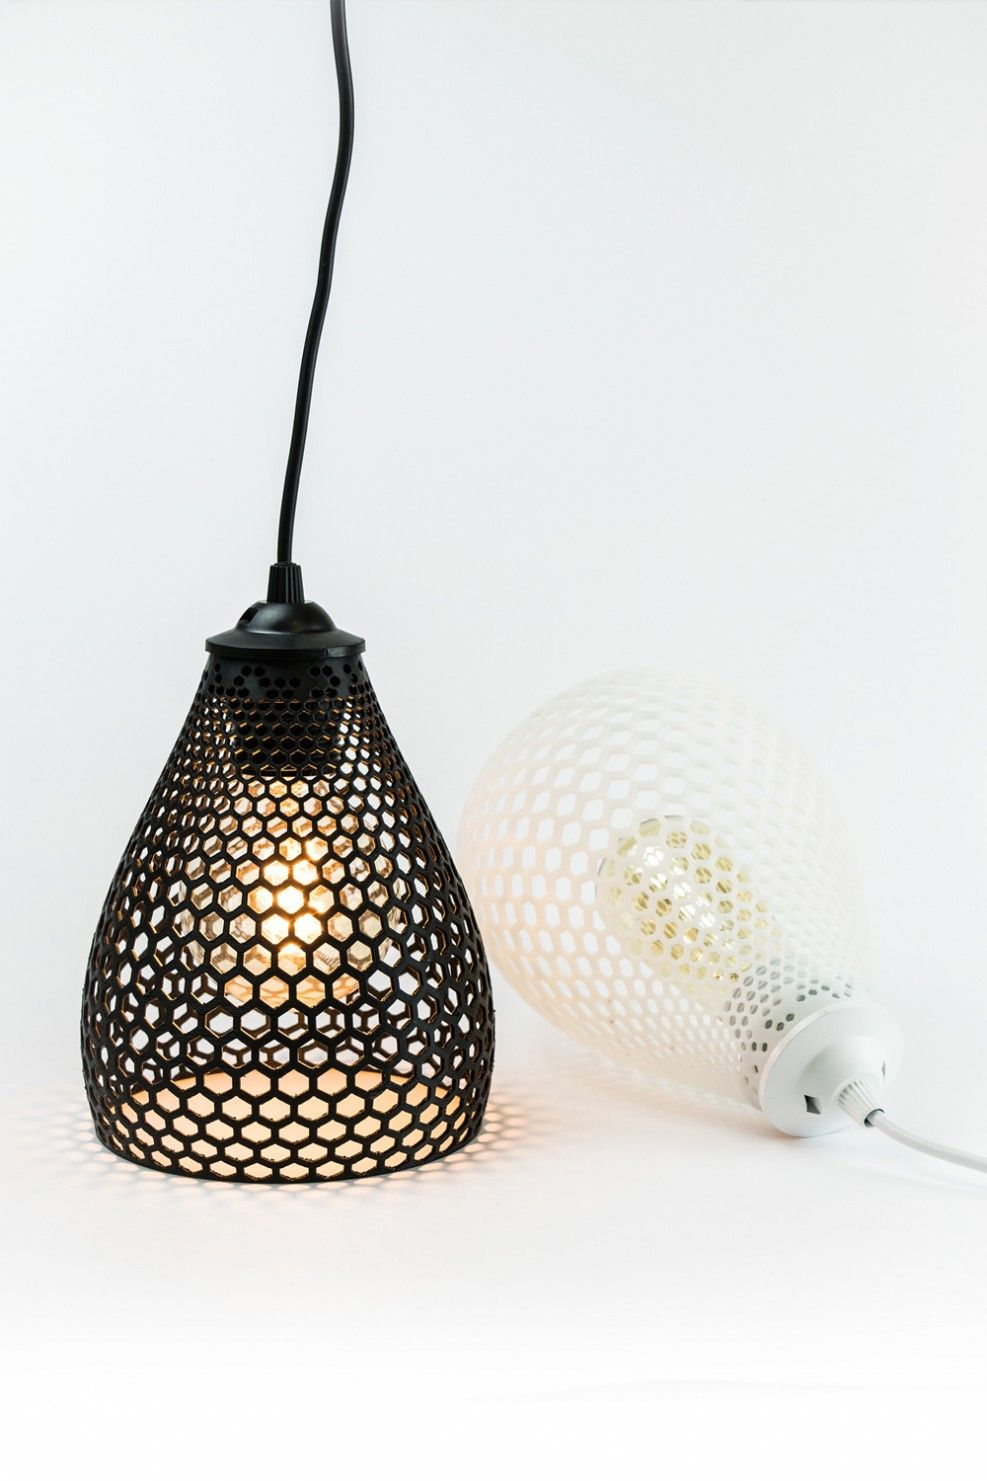 Lampion Design Exemples Par Voood3d Printing Studio Lamp 3j4L5ARq